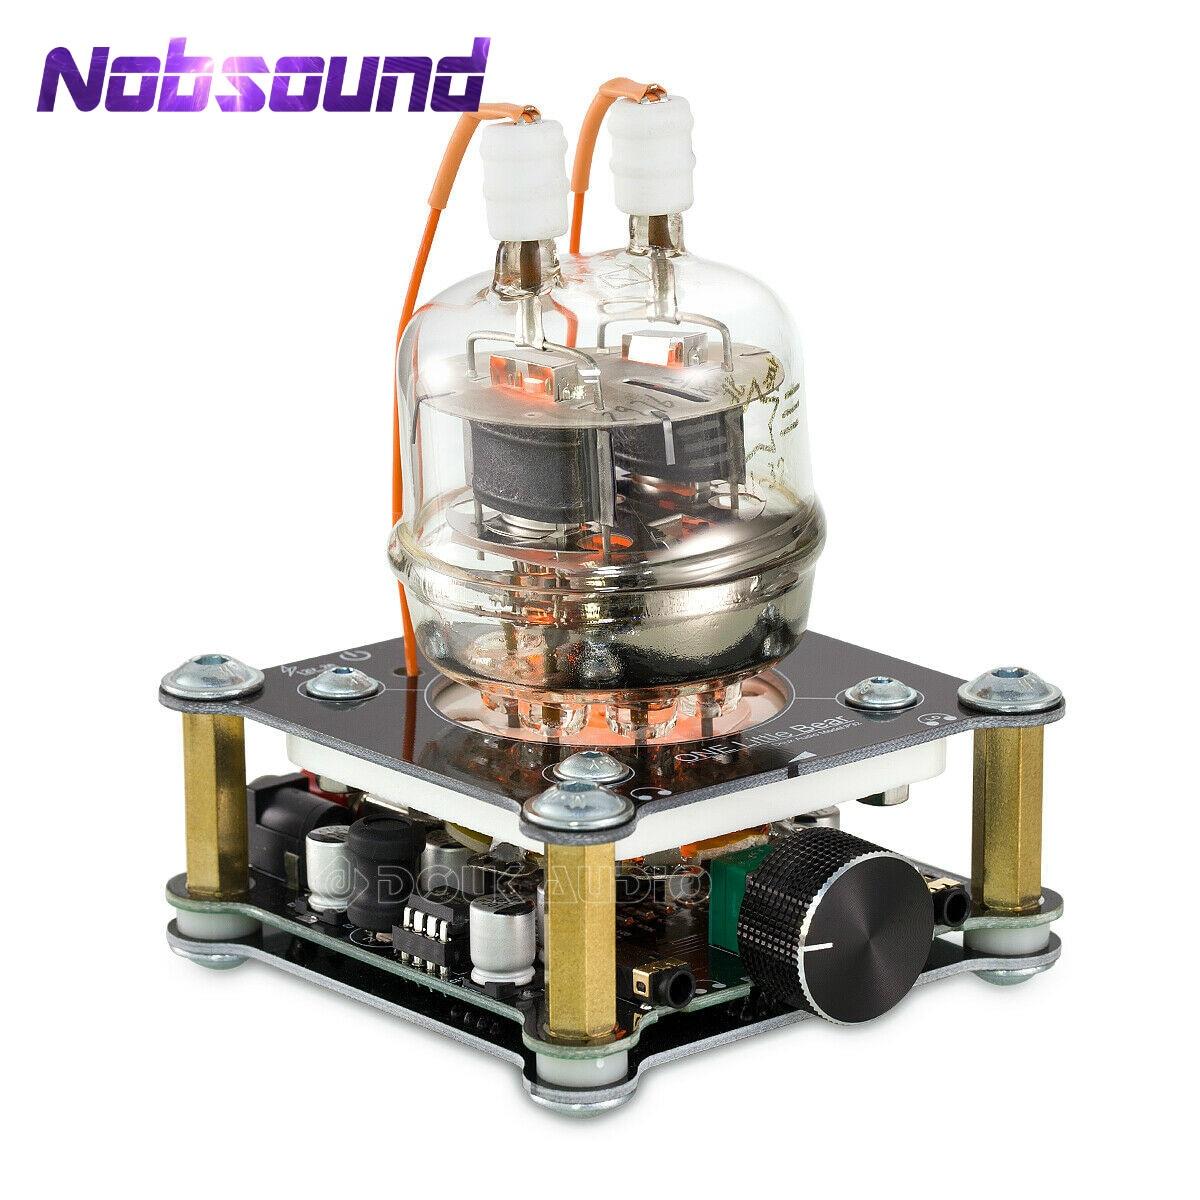 Nobsound Mini FU32(832A) Valve Tube Amplifier Hi-Fi Stereo Preamp Desktop Tube Headphone Amp